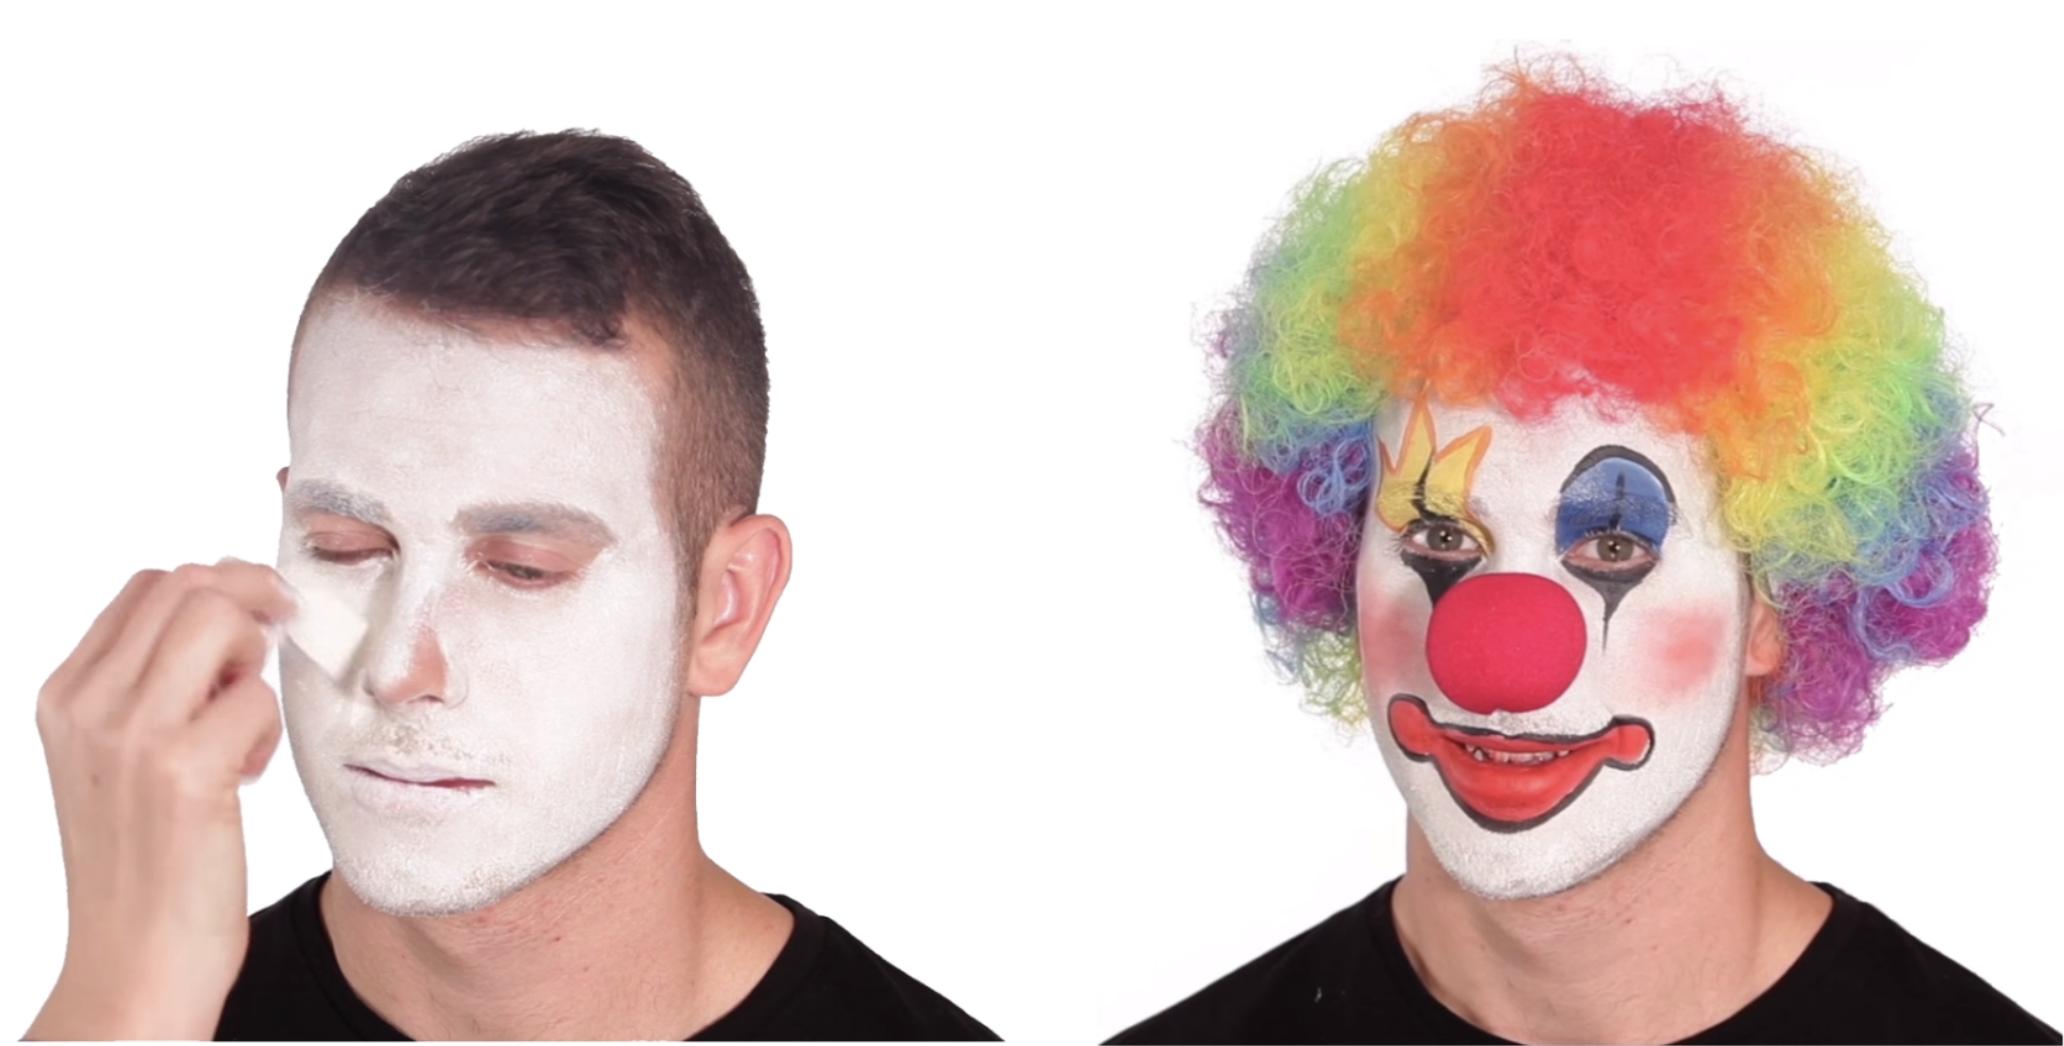 clown make up meme